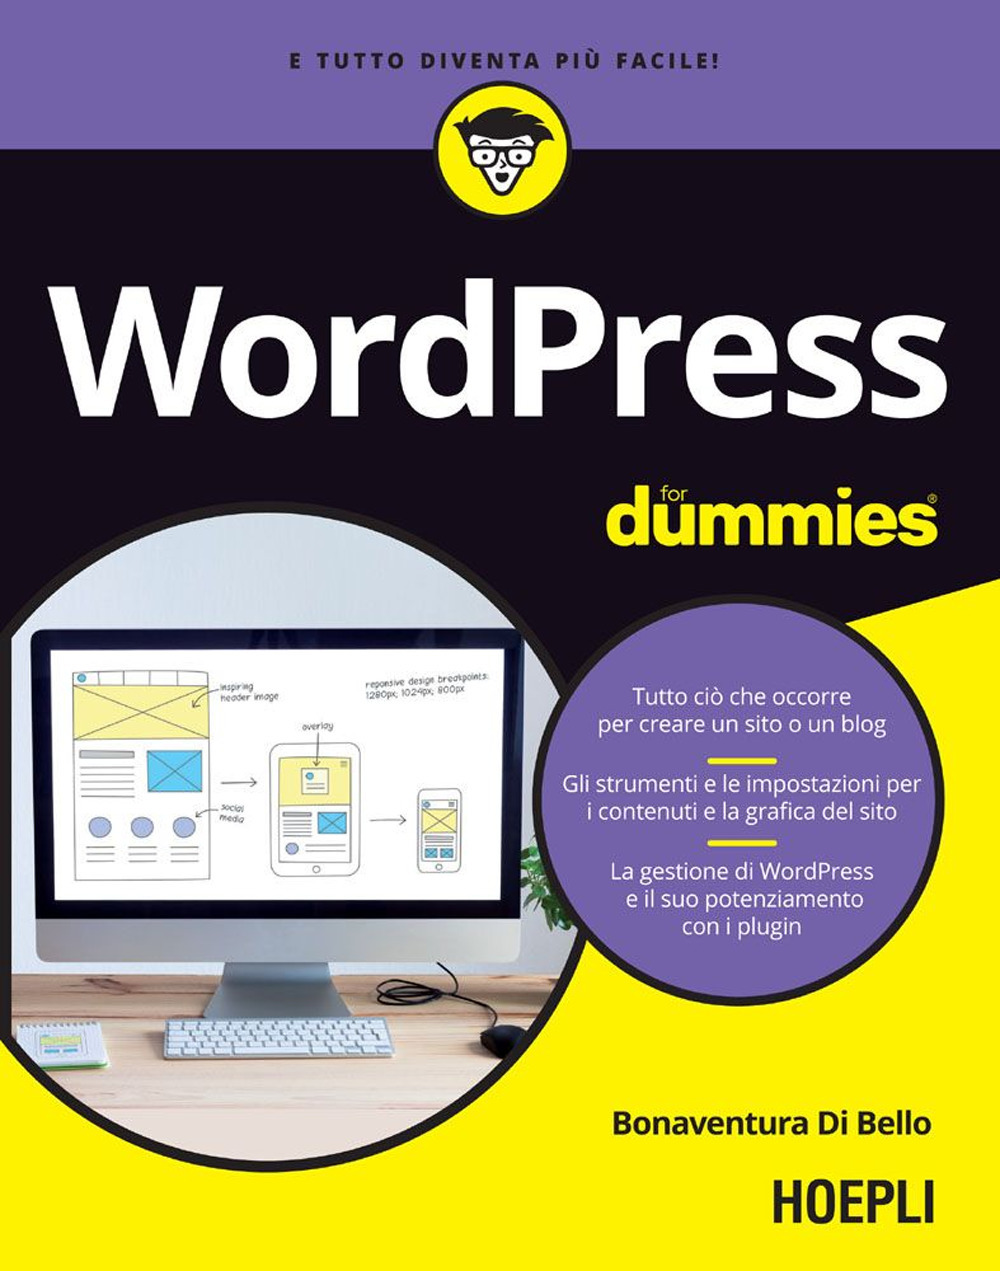 Image of Wordpress for dummies